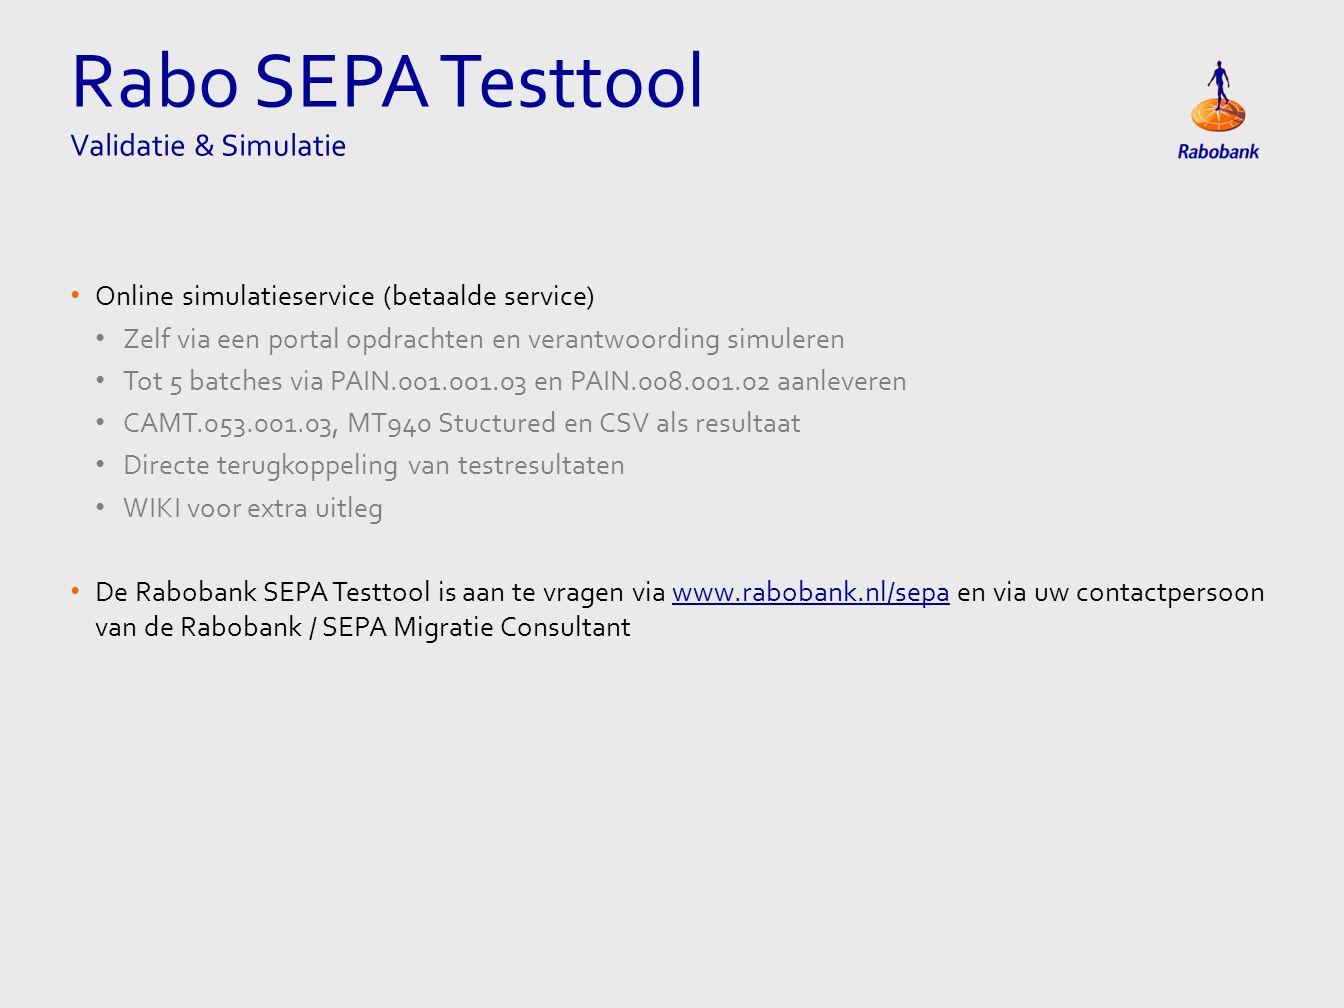 Rabo SEPA Testtool Validatie & Simulatie